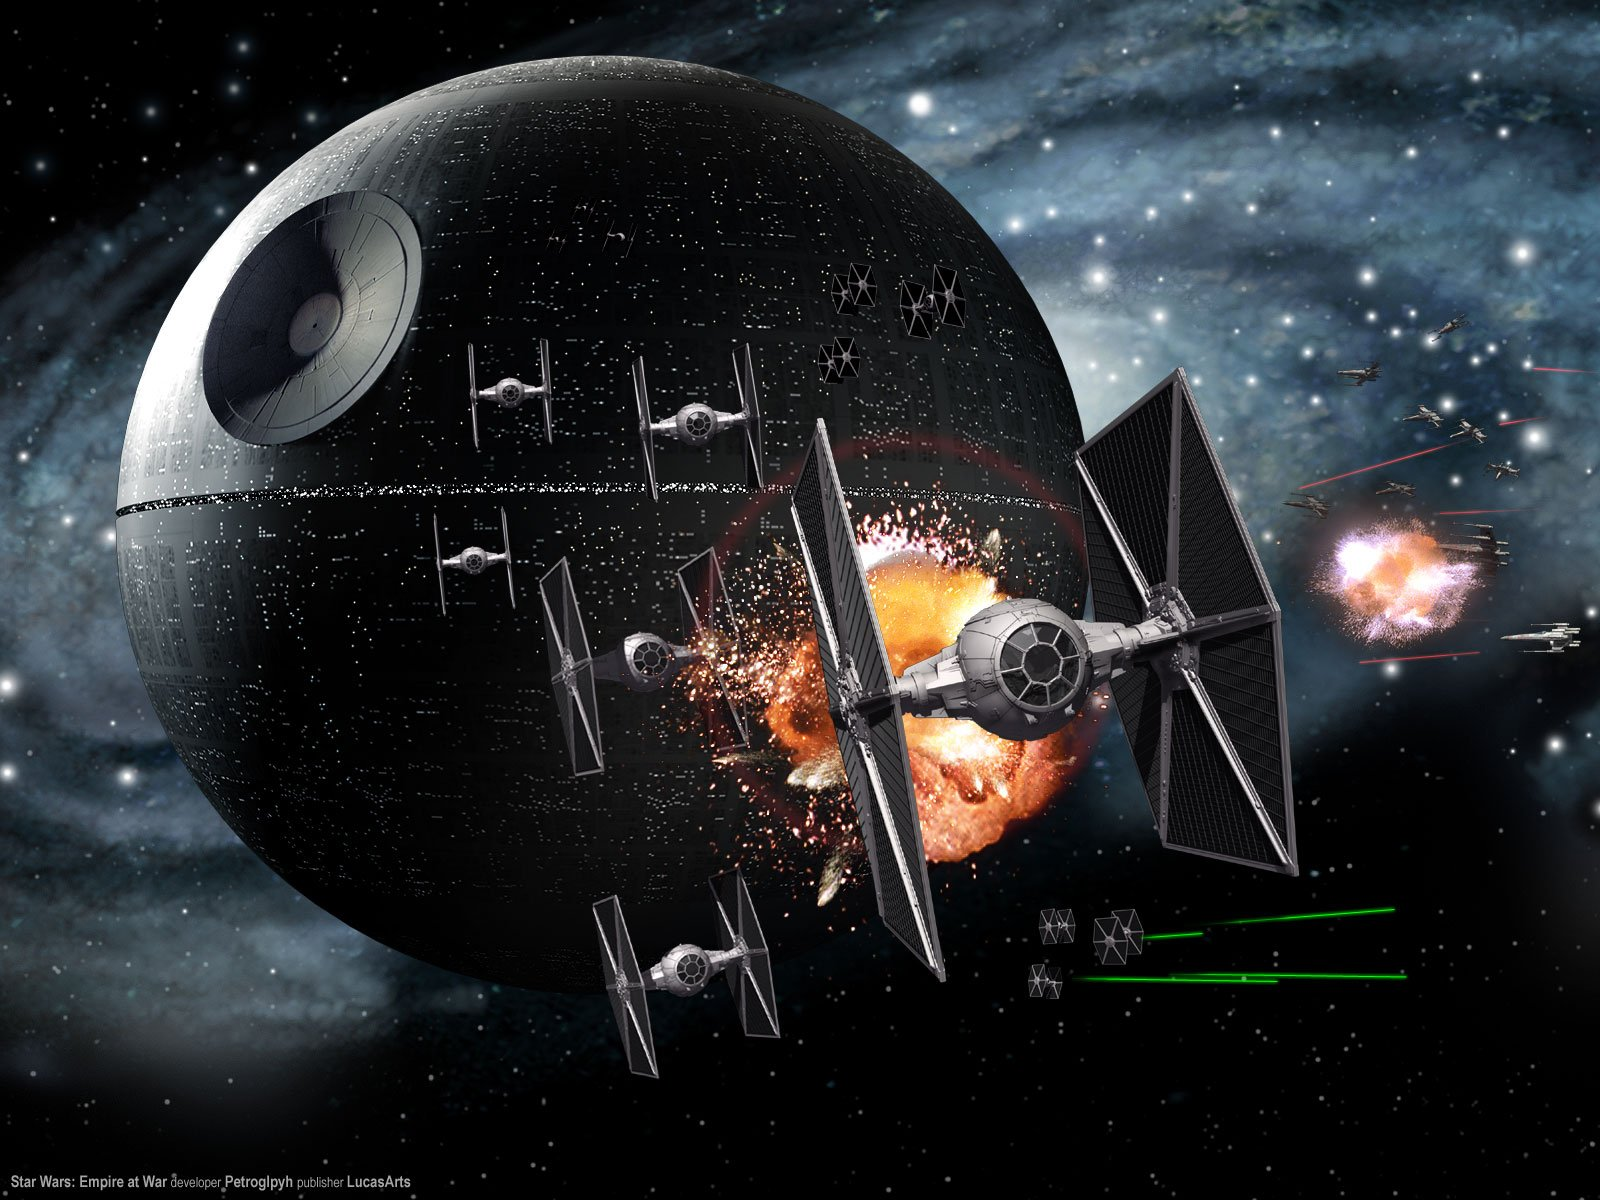 Star Wars wallpapers 1920x1080 Full HD 1080p desktop